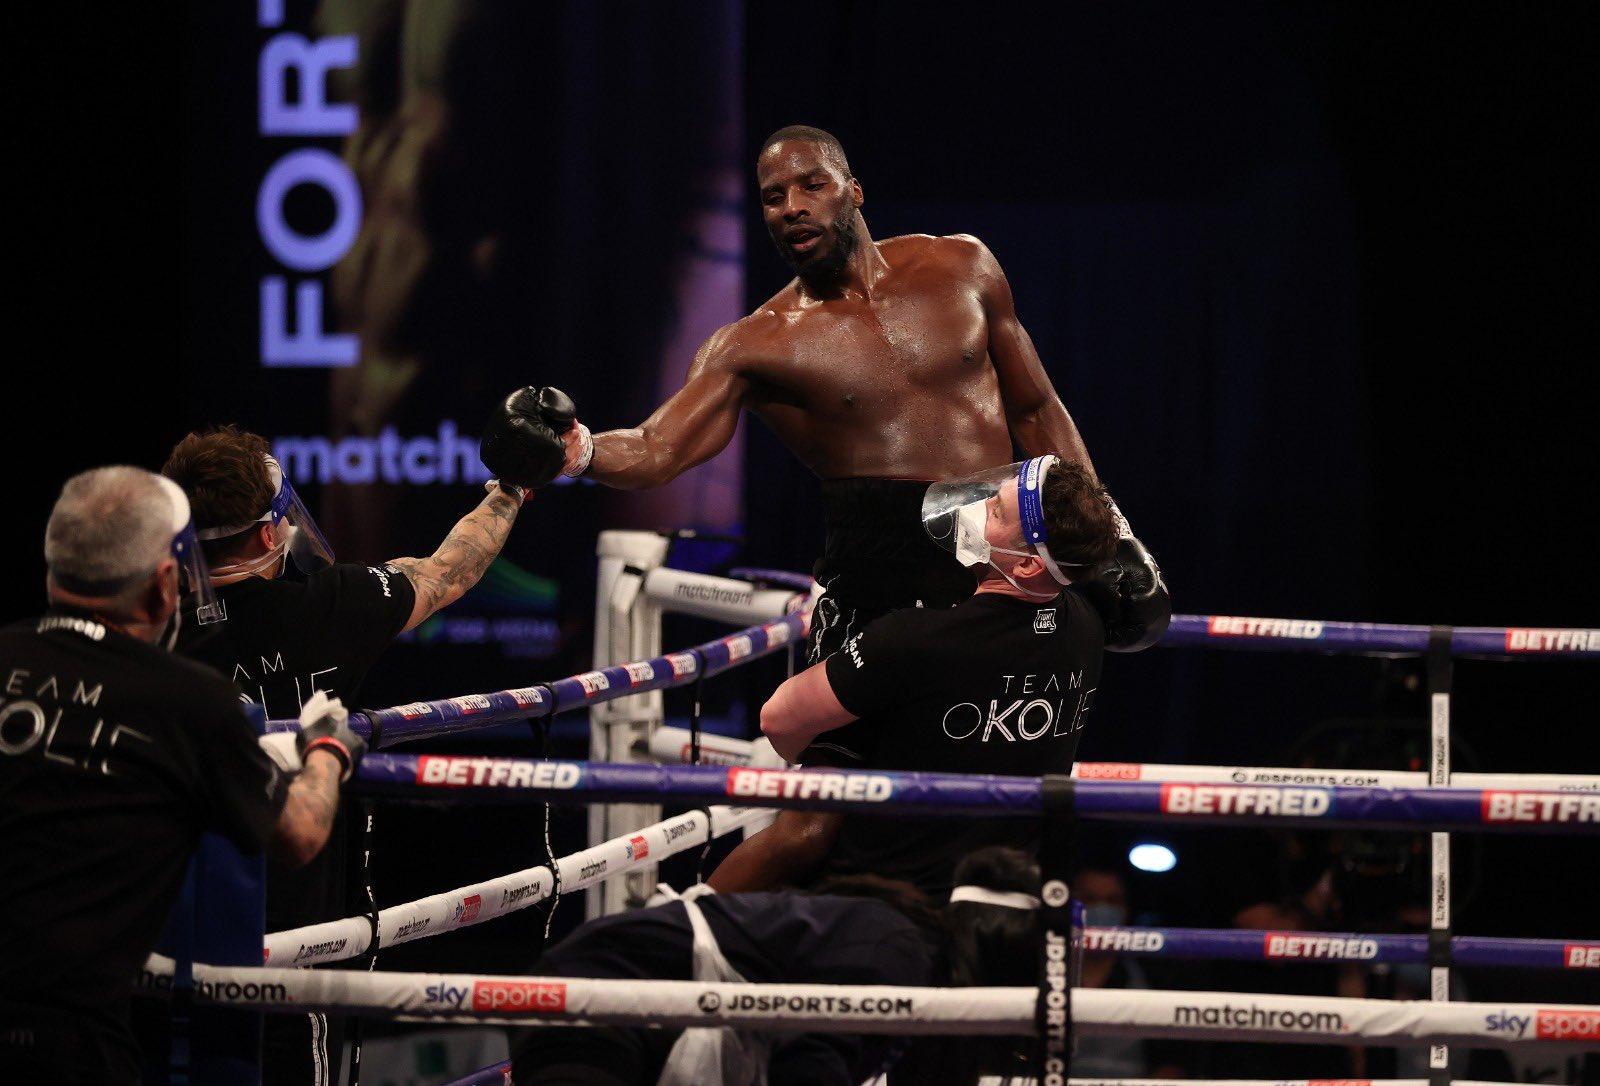 WBO cruiserweight titlist Lawrence Okolie puts focus on Dilan Prasovic before anything heavy arises